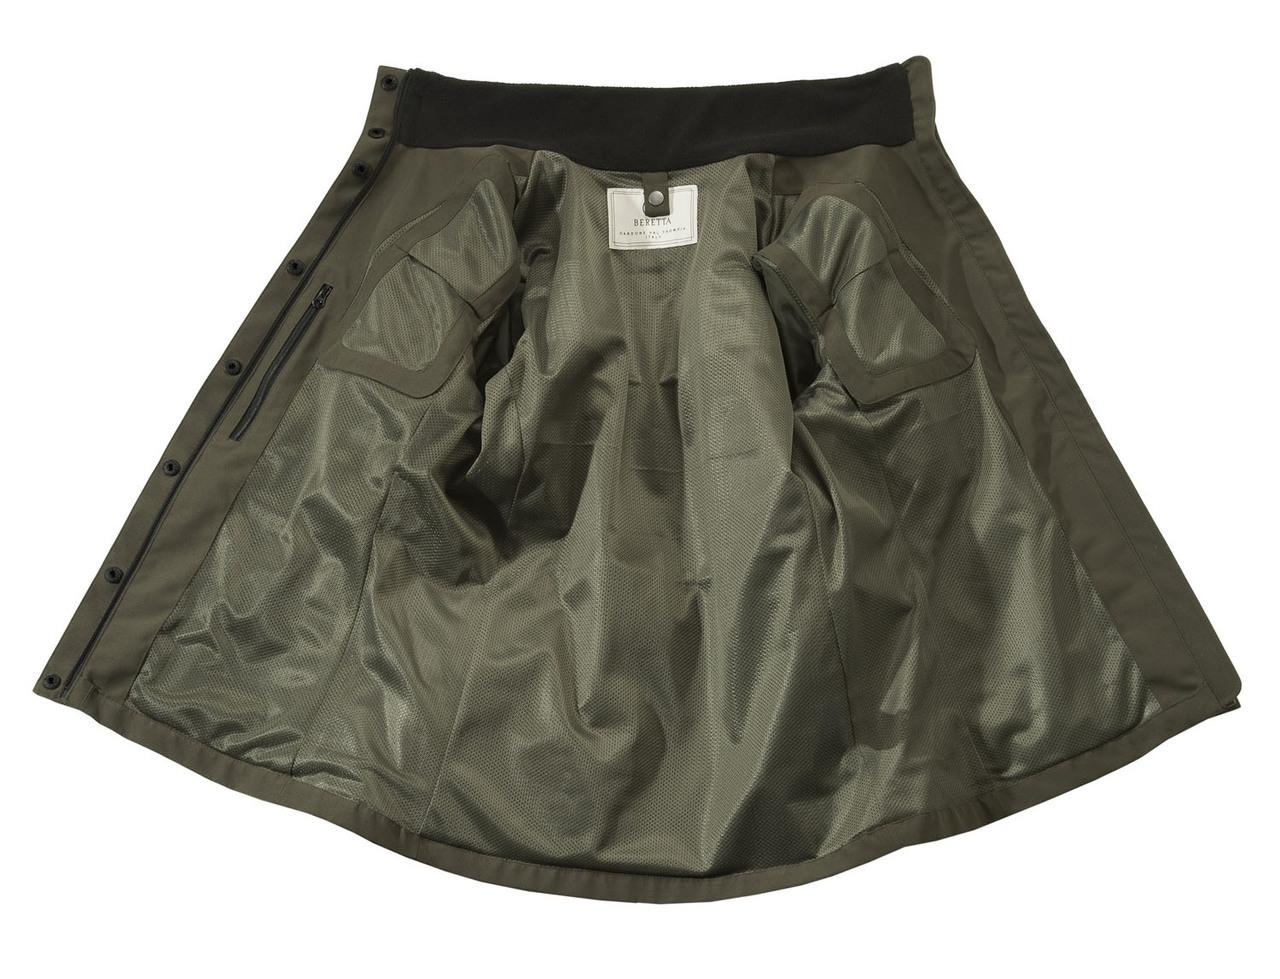 Beretta Women's Light Active Jacket-Lining